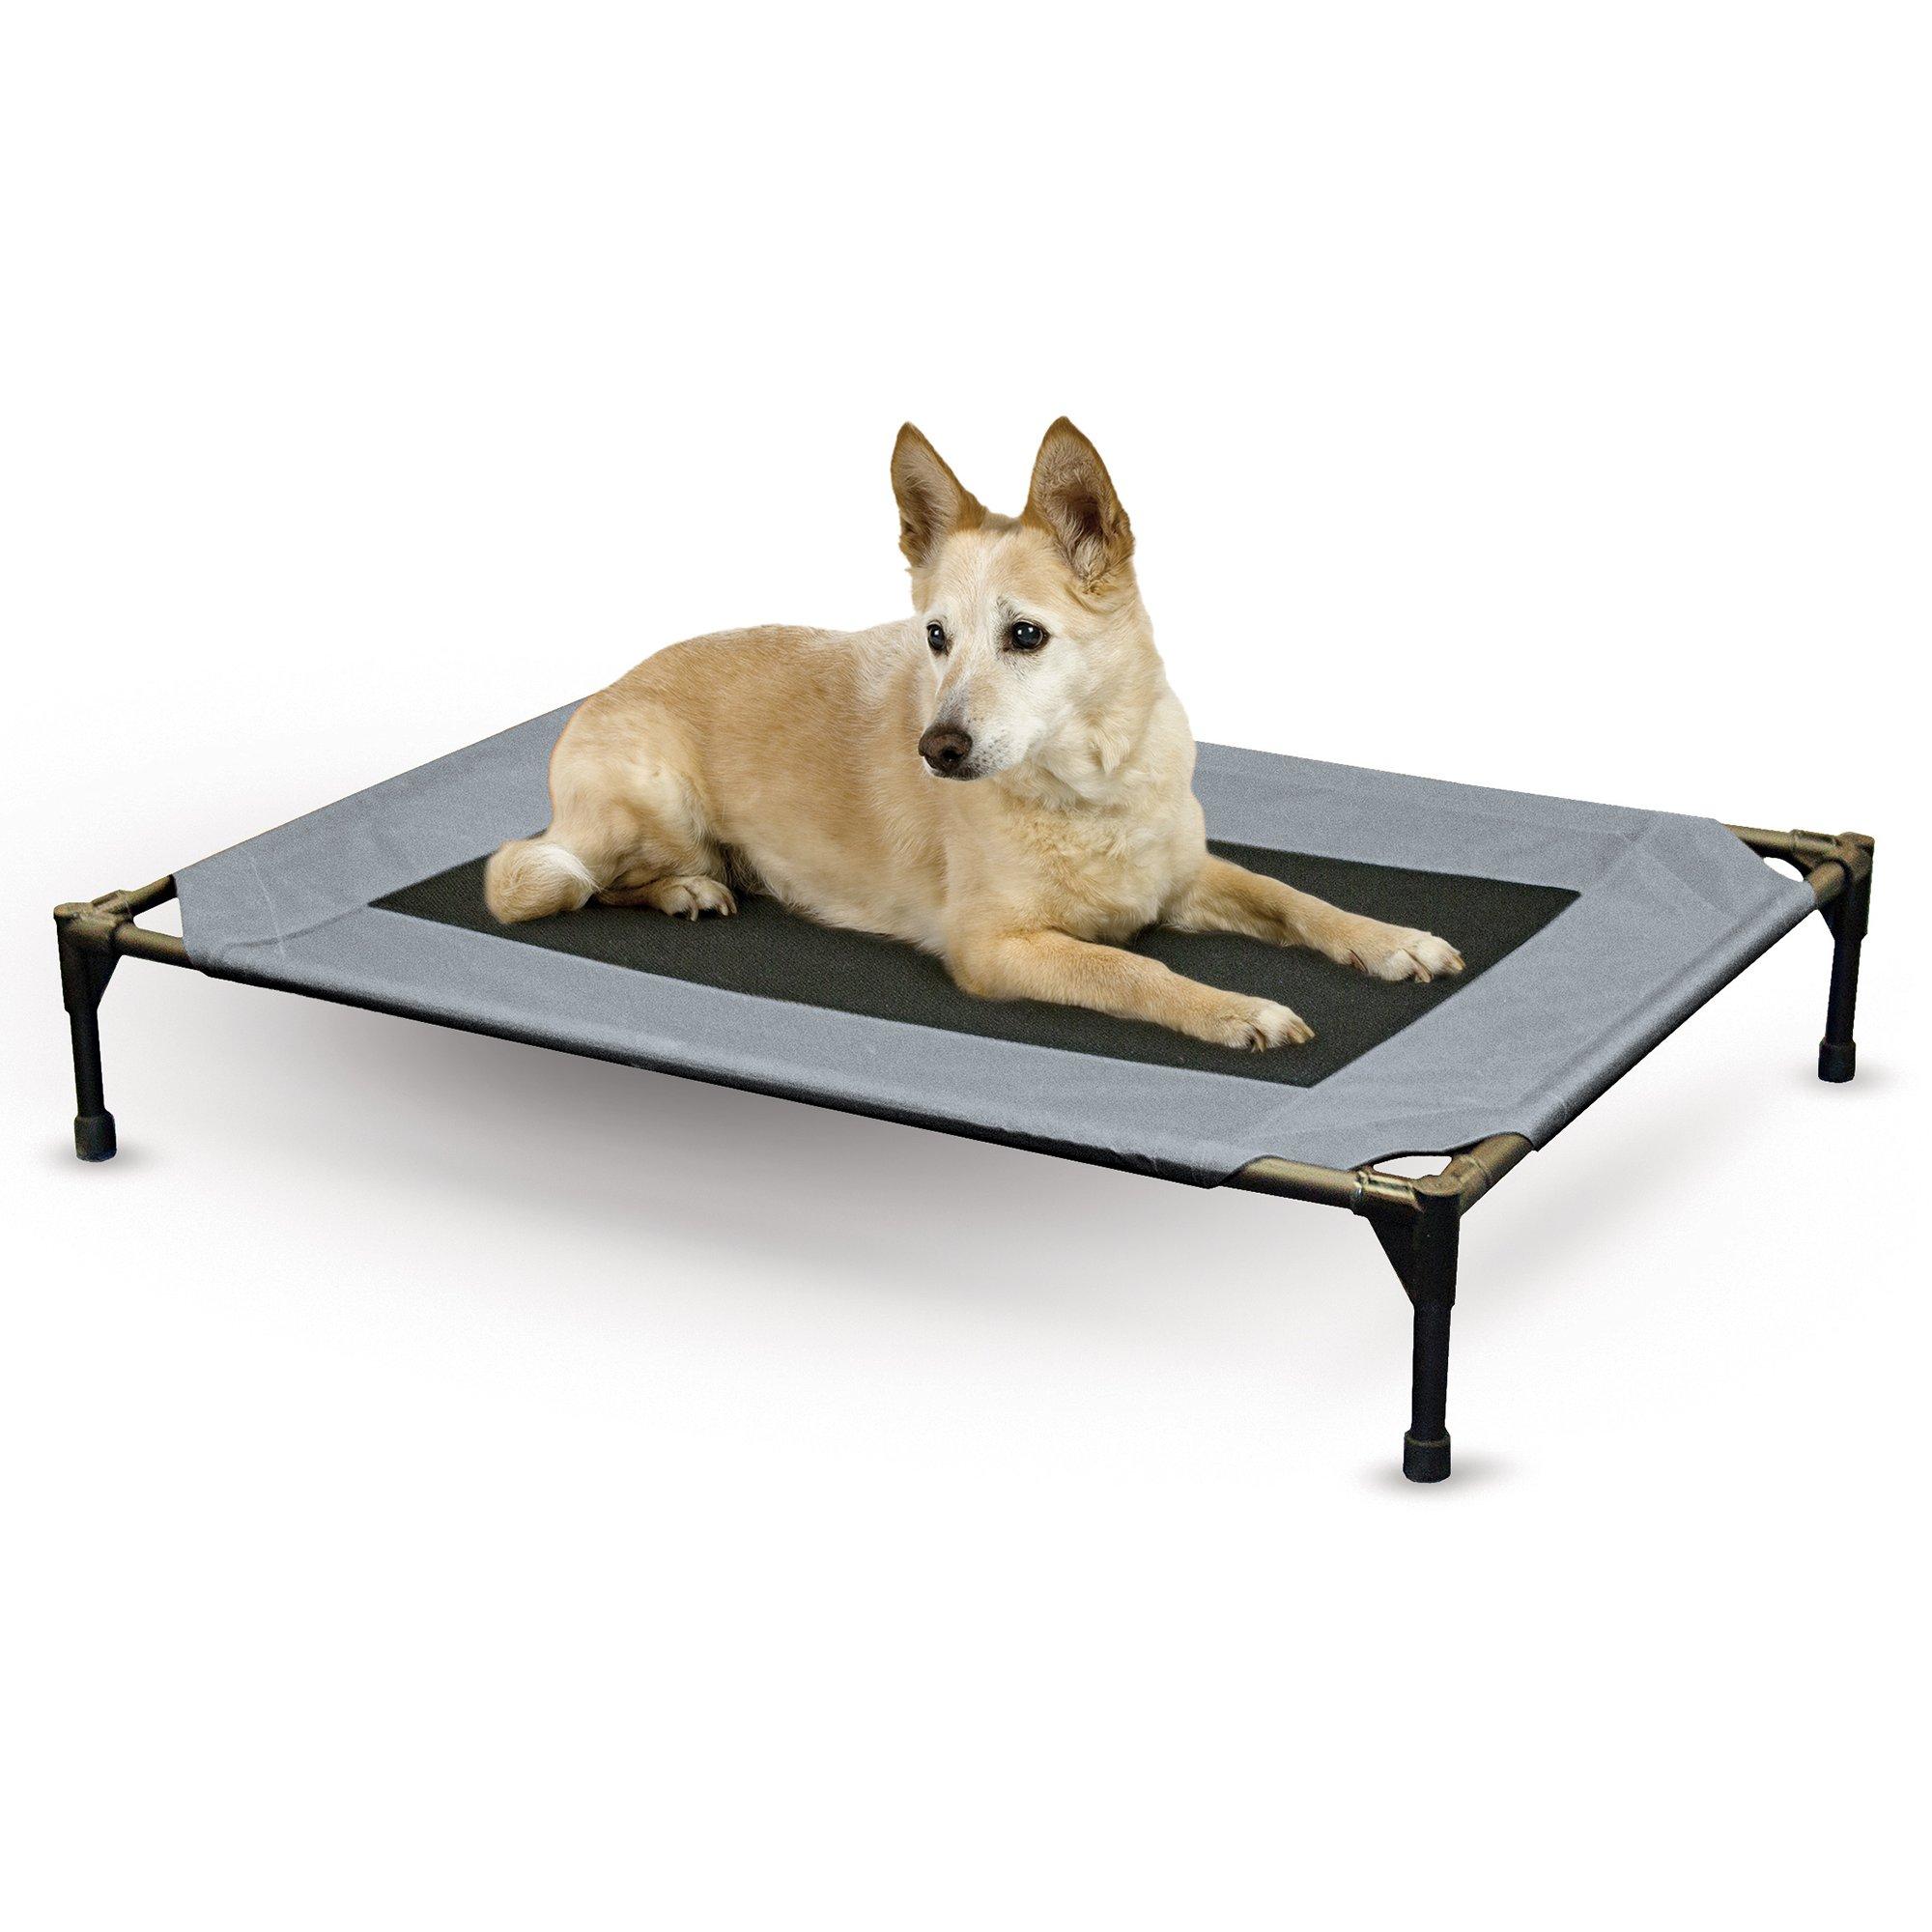 cat diy inspirations meowlogy hammocks dog hammock for pet furniture great giving design